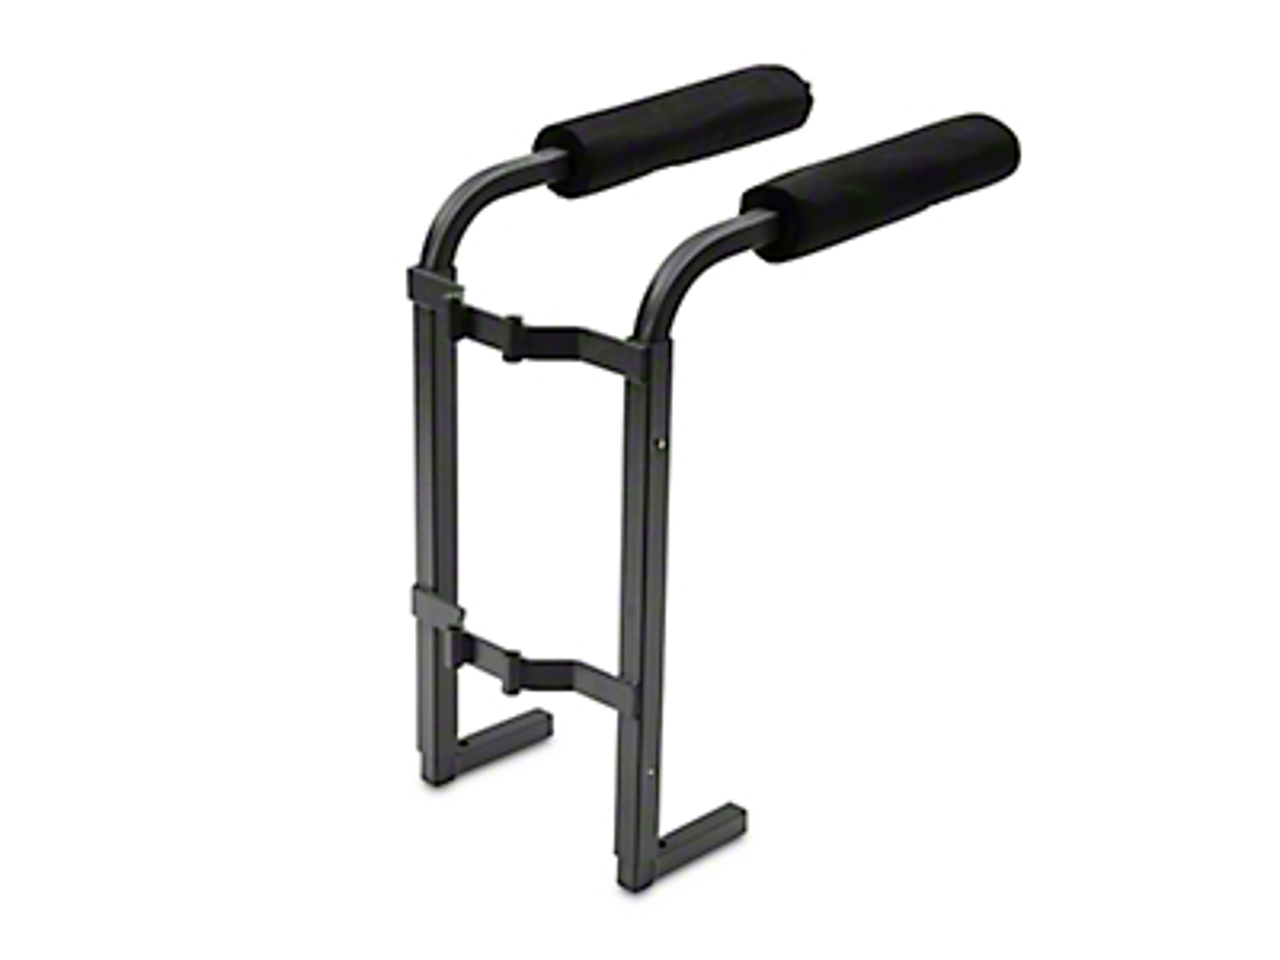 Lange Hoist-A-Cart Door Hanger & Freedom Top Storage Accessory (87-18 Wrangler YJ, TJ & JK)